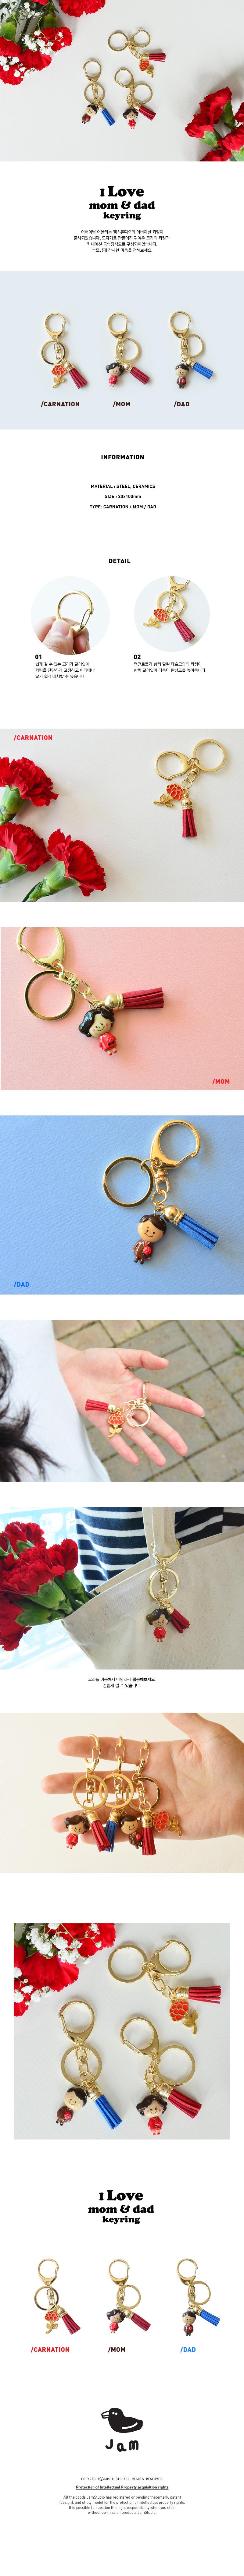 Mom Dad Keyring - 잼스튜디오, 7,000원, 열쇠고리/키커버, 커플